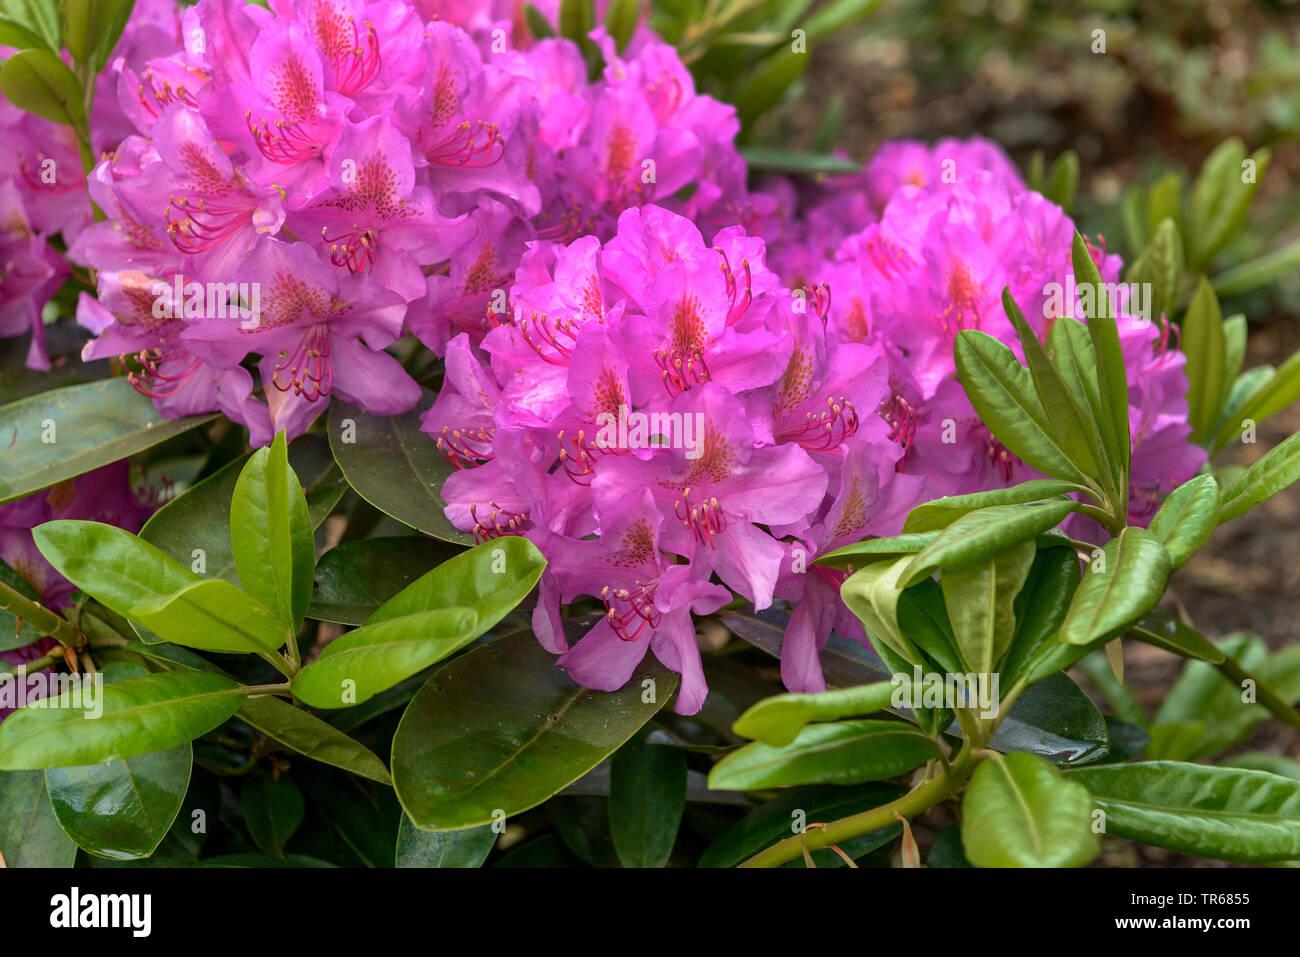 "Rhododendron Catawba Catawba, Rose Bay (Rhododendron 'Rosa viola sogno"", rododendro rosa sogno viola, Rhododendron catawbiense), fioritura, cultivar rosa sogno viola Immagini Stock"